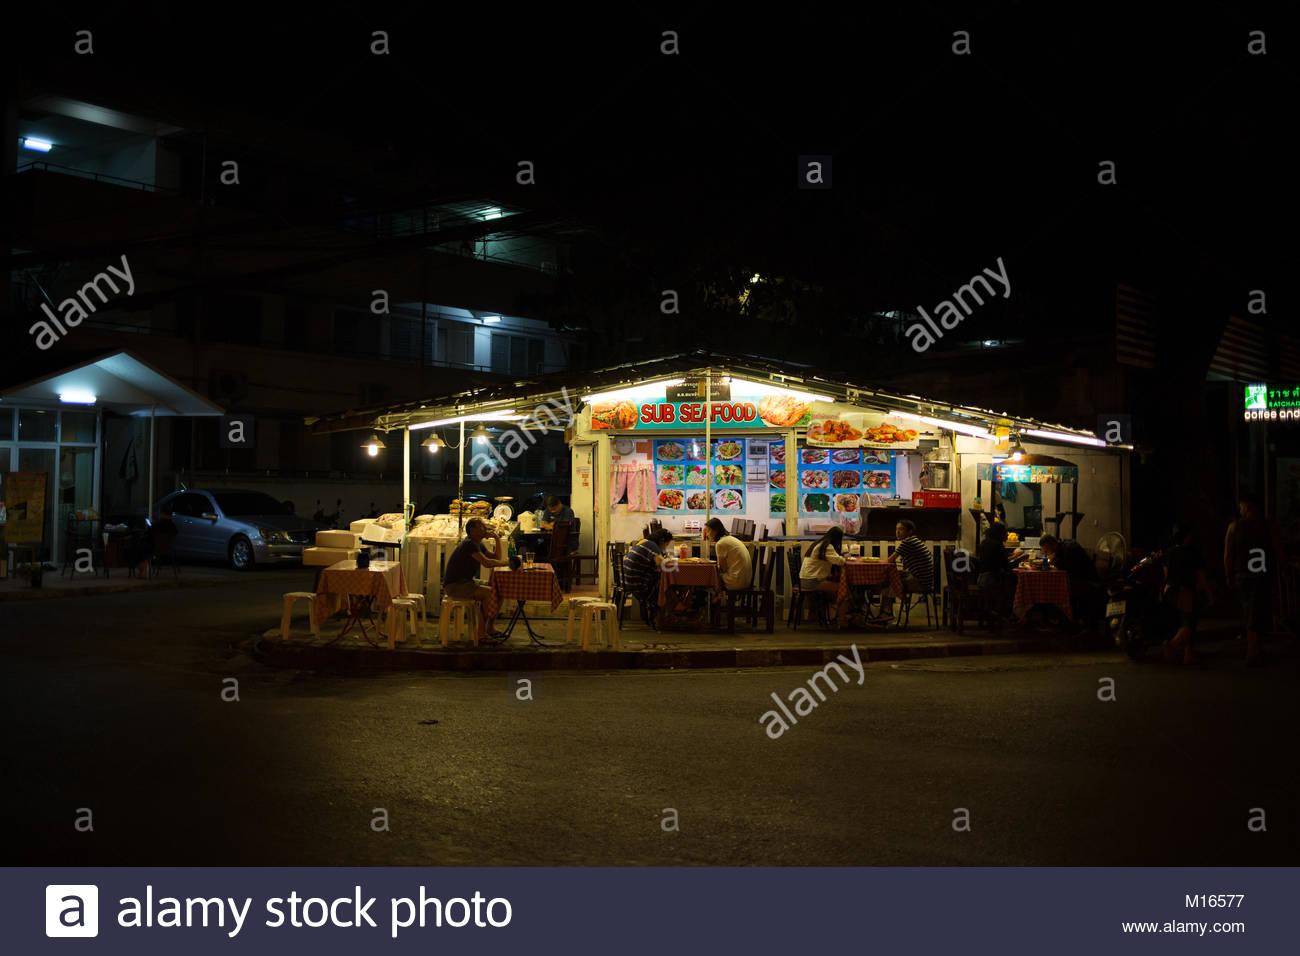 Seafood Restaurant Stockbild